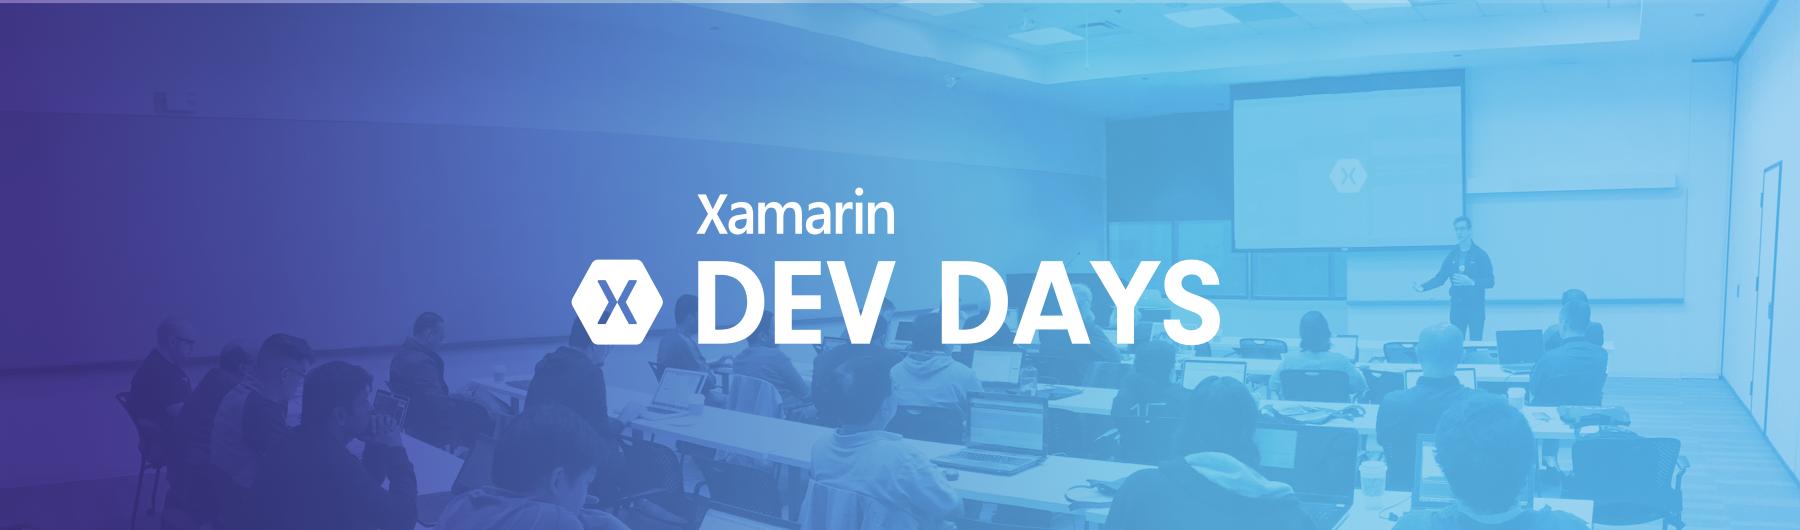 Xamarin Dev Days - Latham